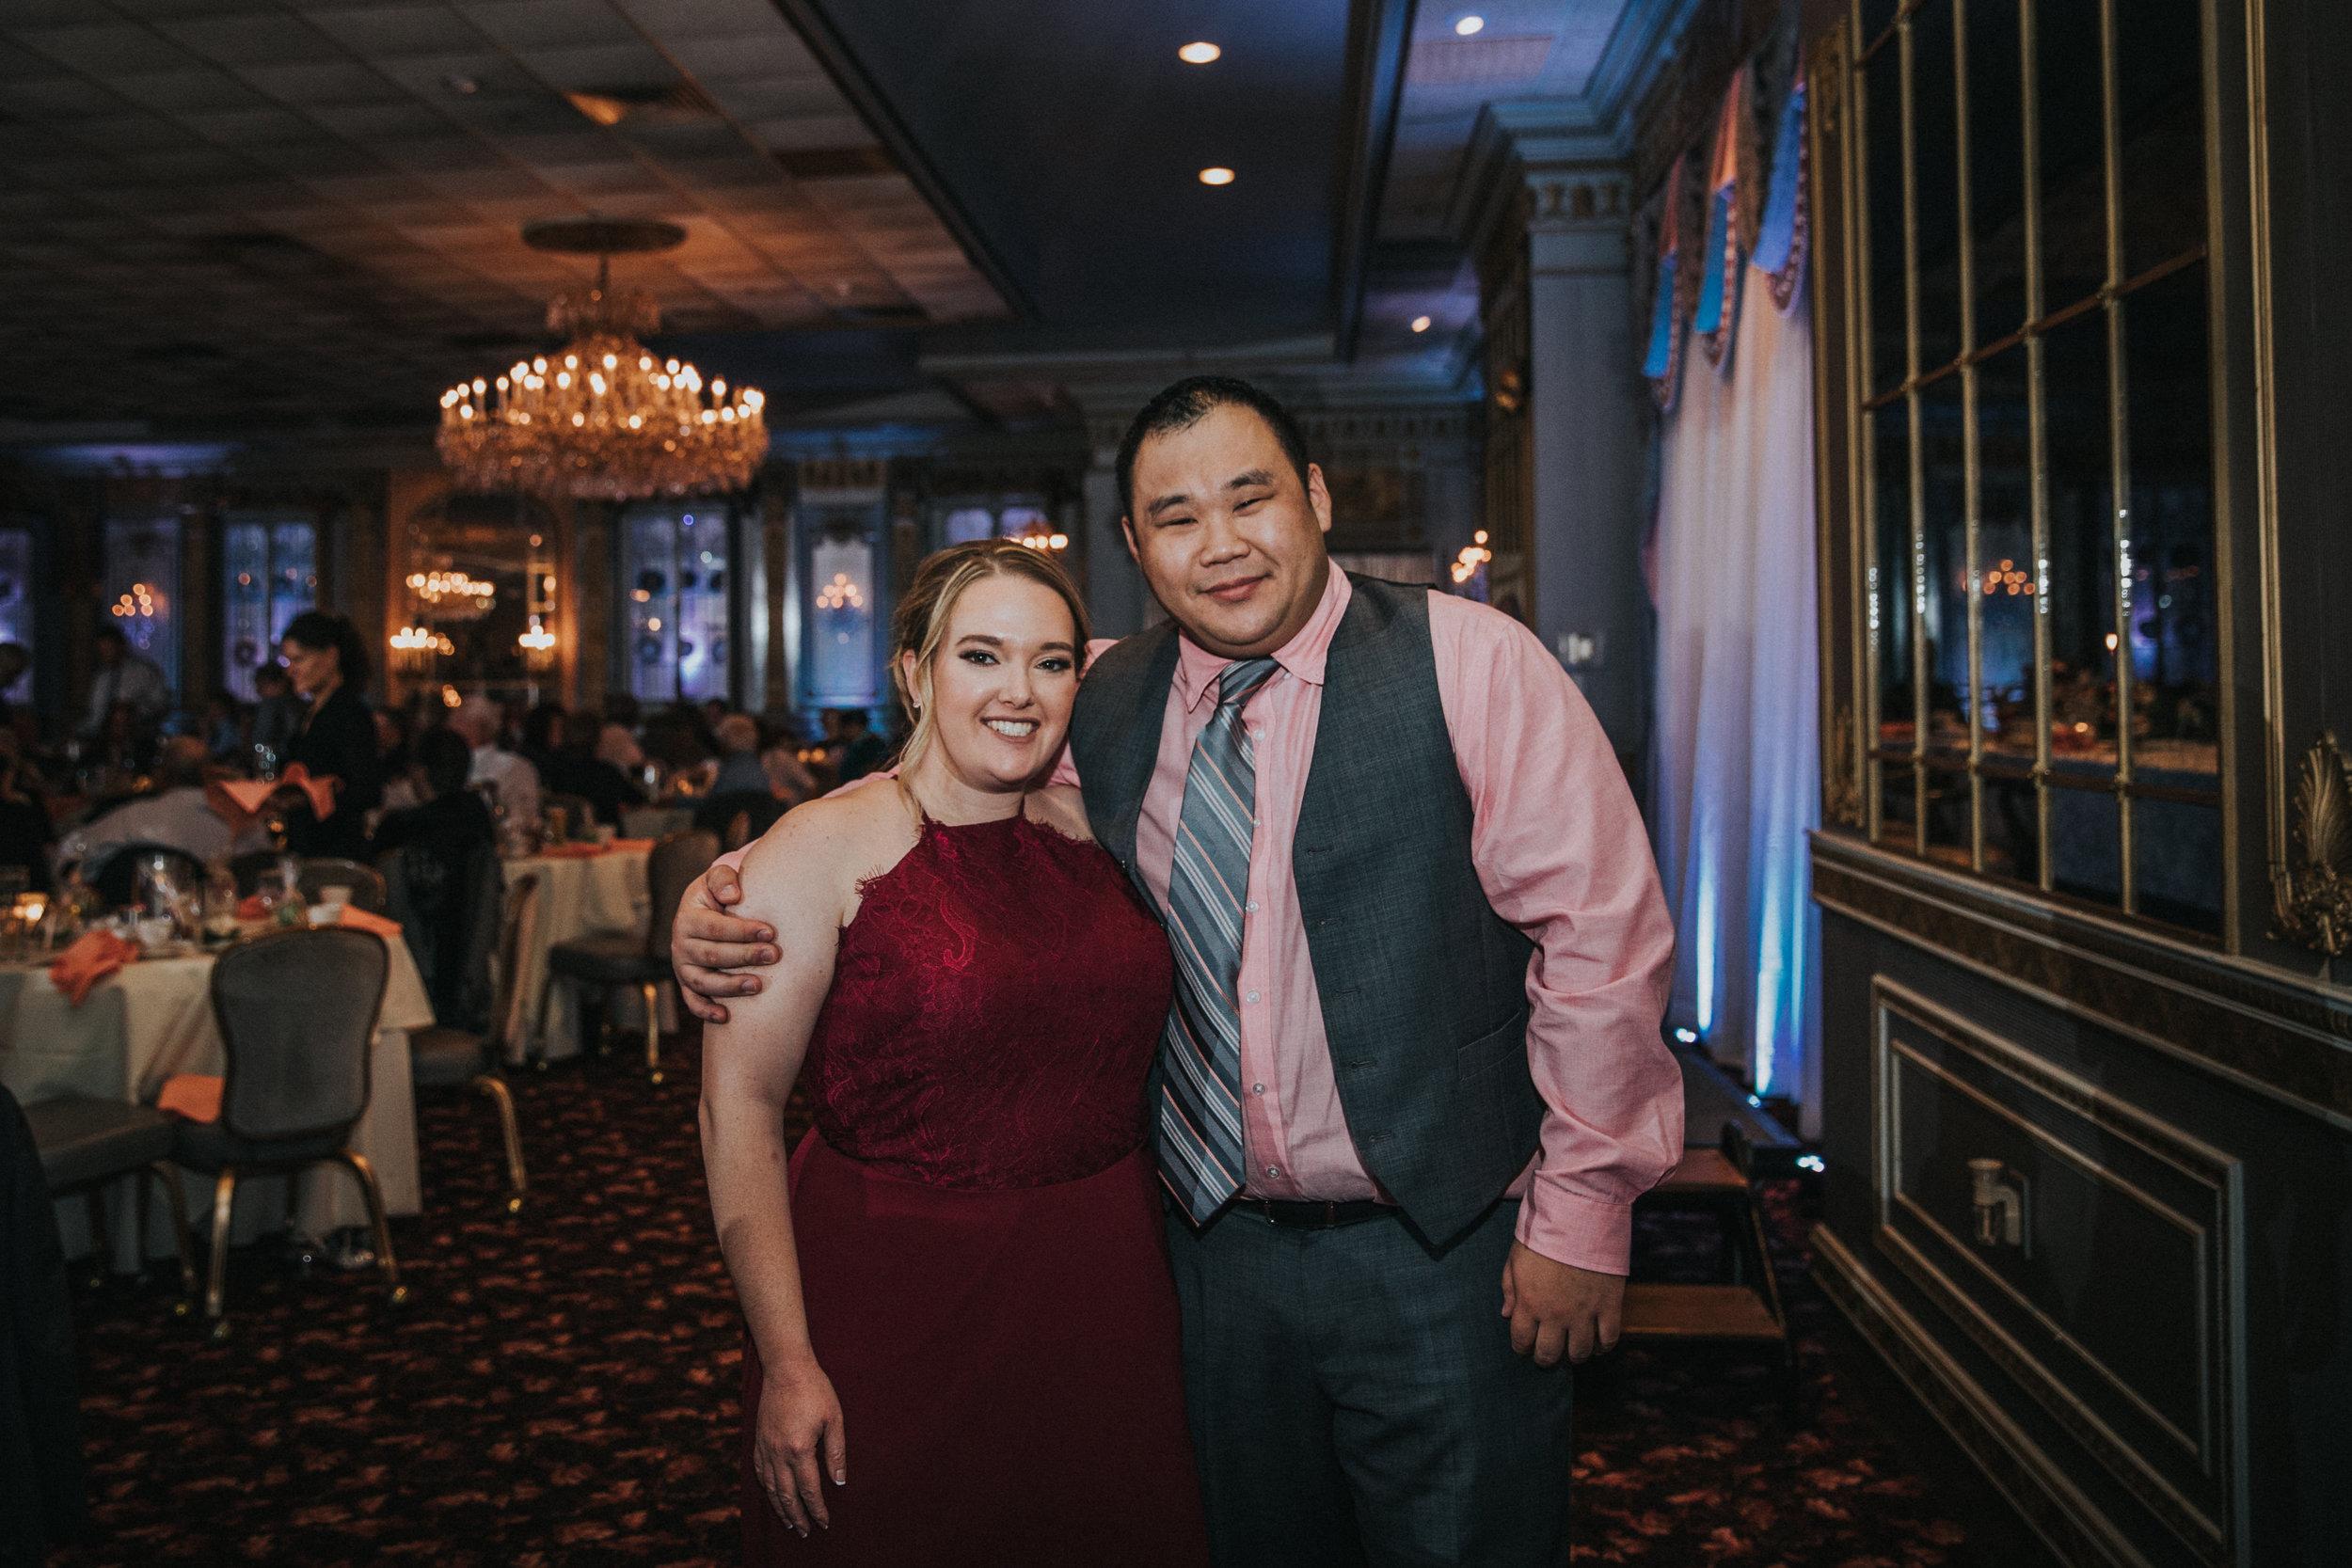 New-Jersey-Wedding-Photography-Fishers-Tudor-House-JennaLynnPhotography-Reception-Kathleen&Eddie-171.jpg